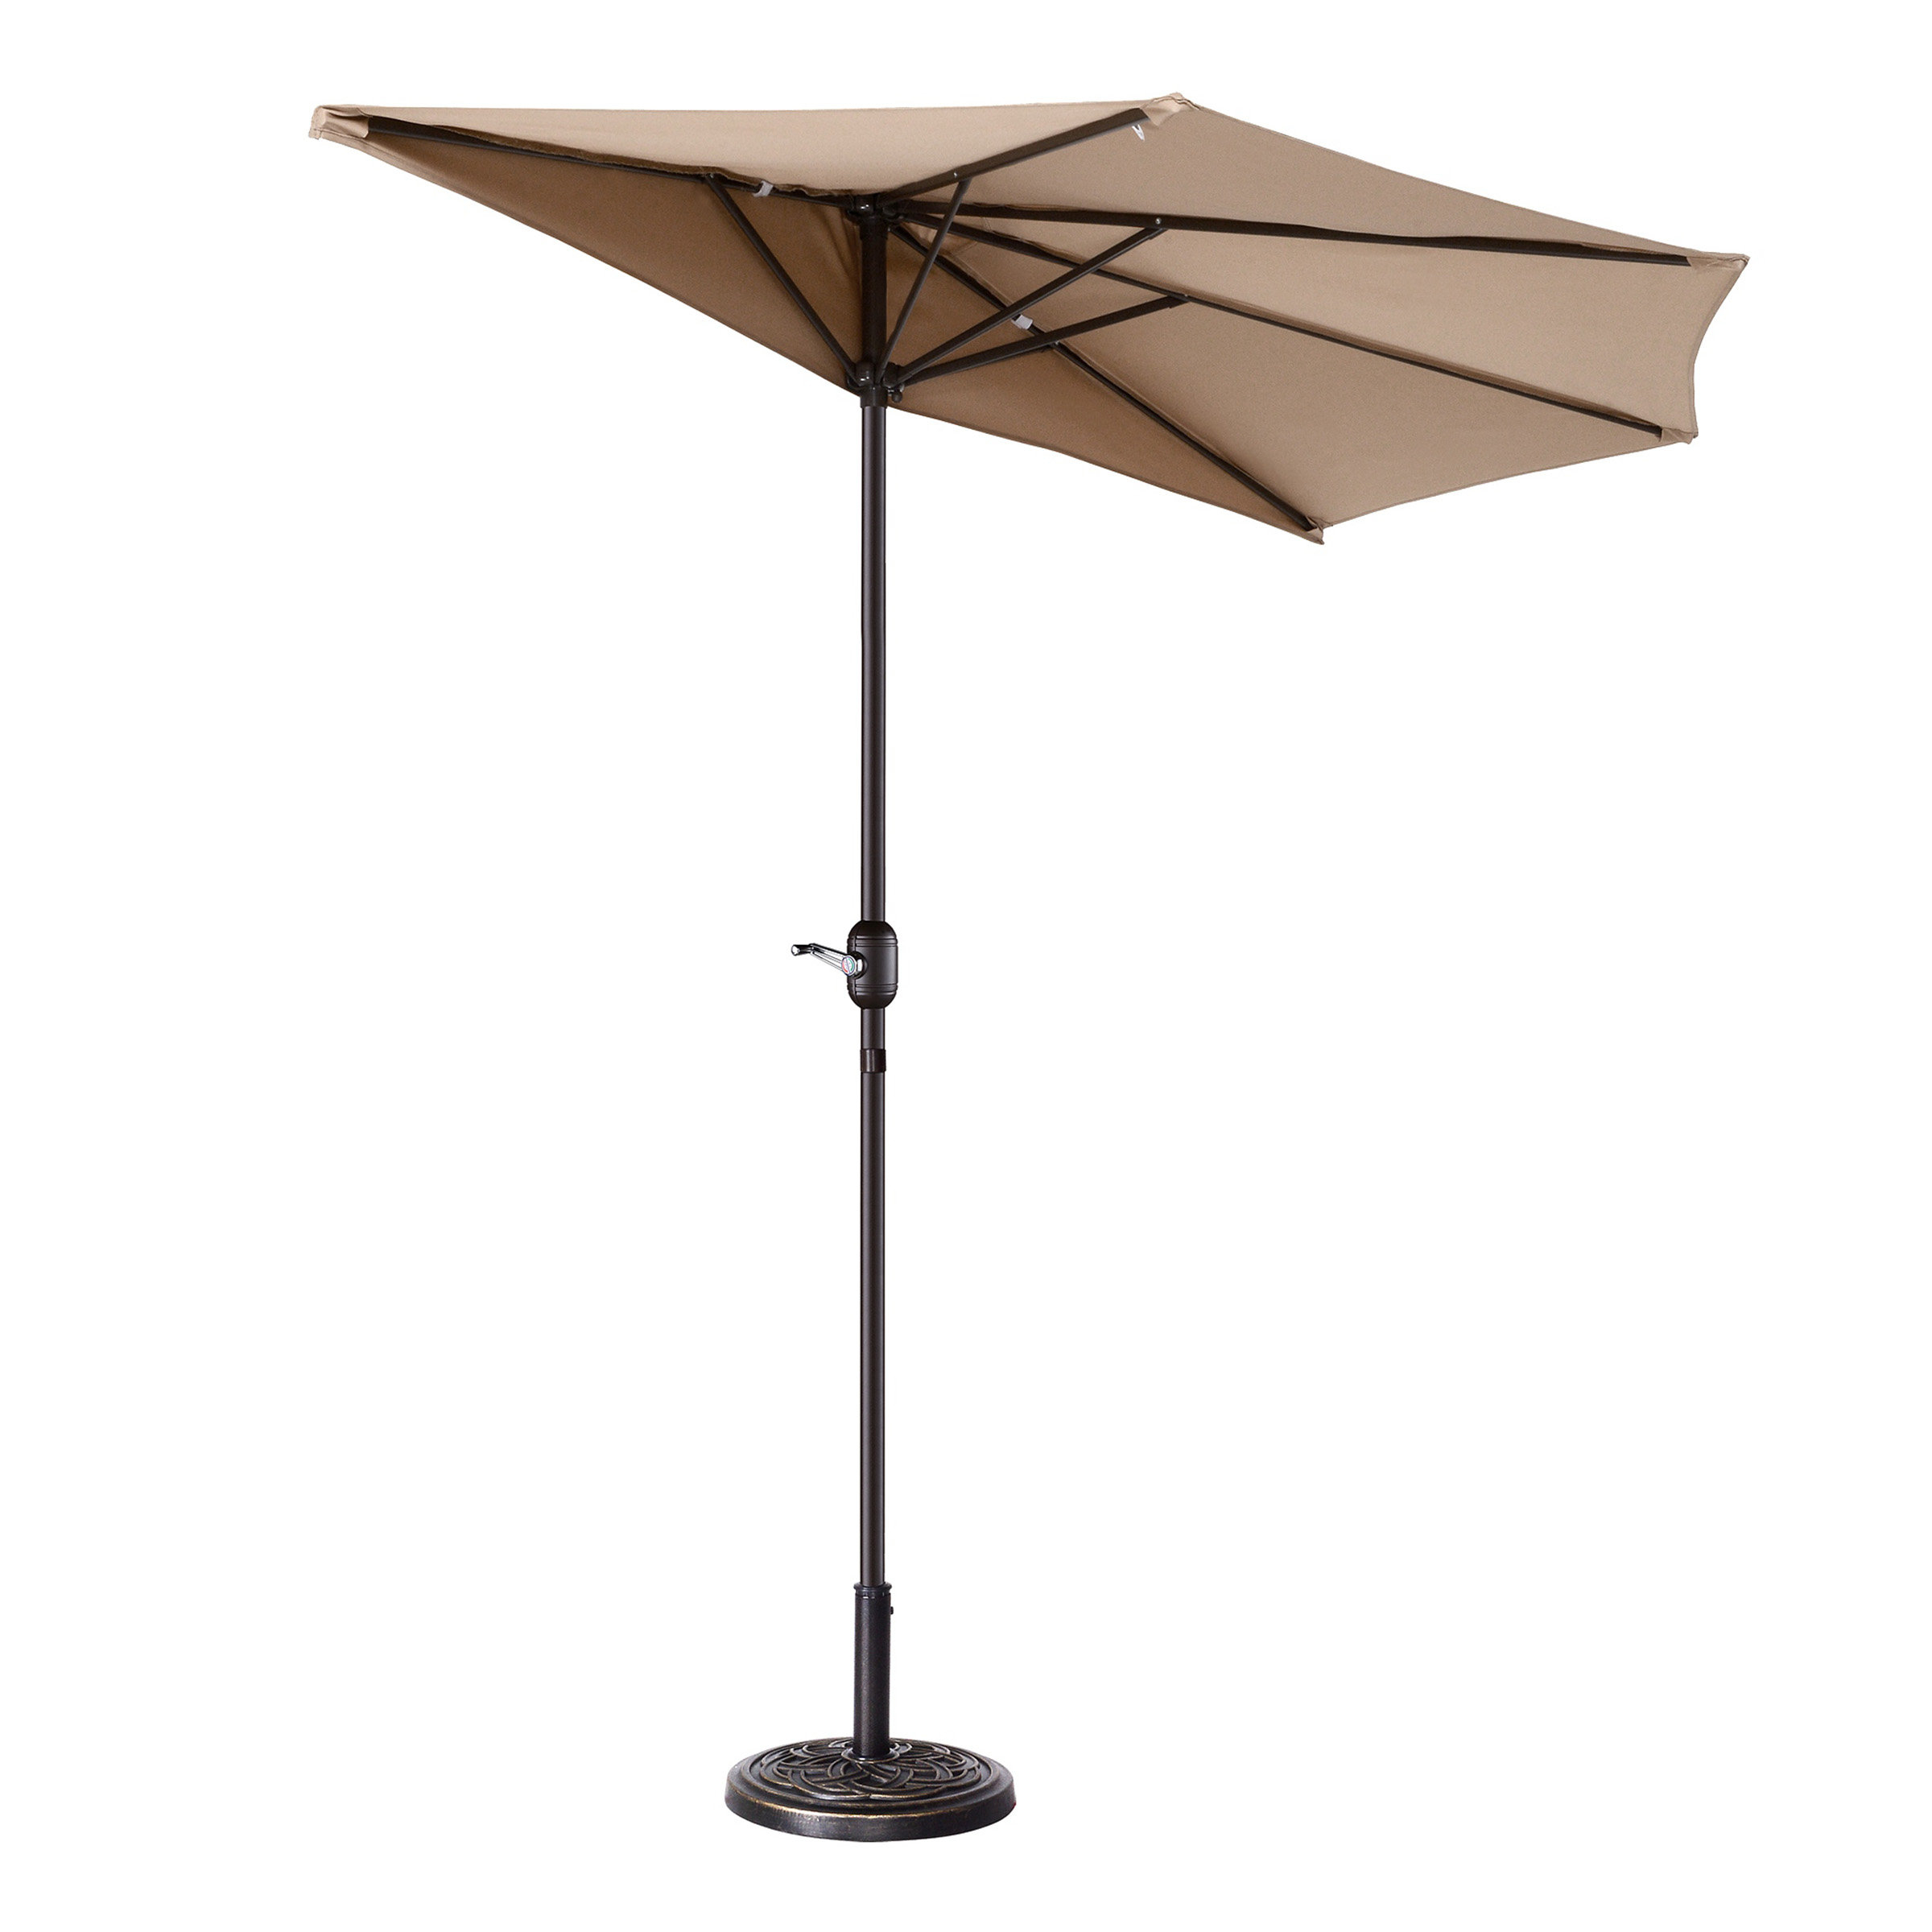 Popular Colburn Half 9' Market Umbrella Throughout Alder Half Round Outdoor Patio Market Umbrellas (View 16 of 20)